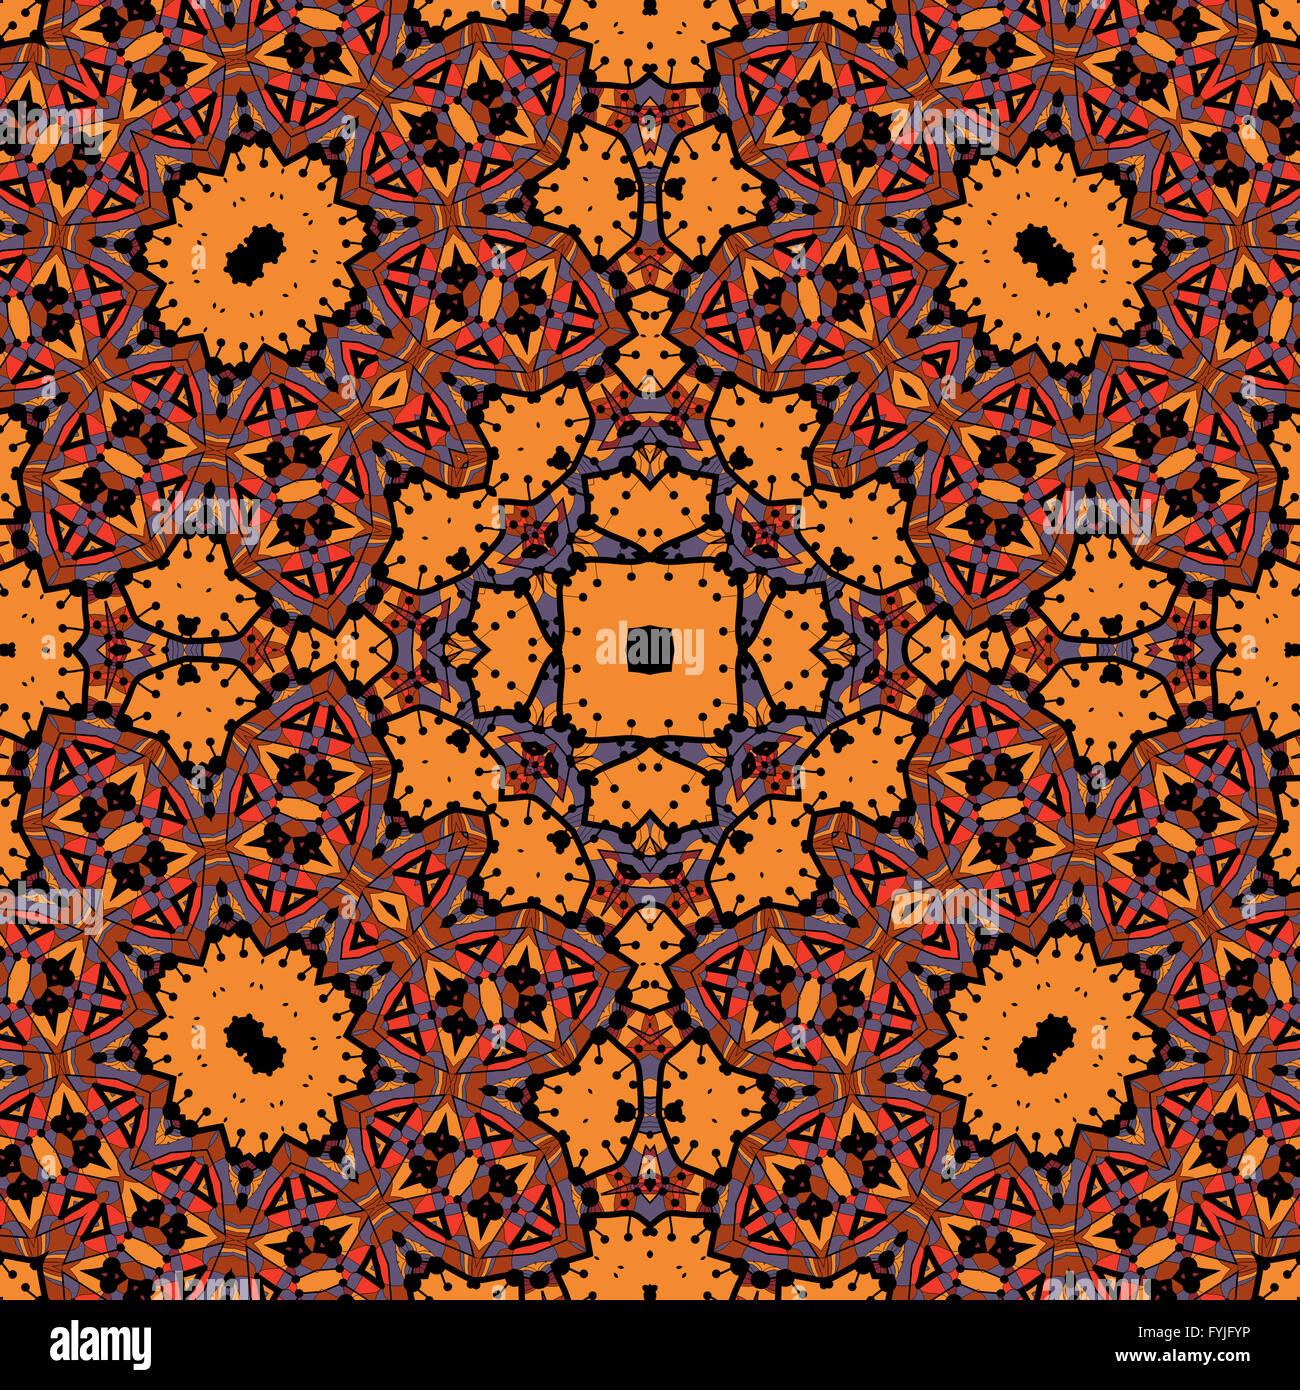 Arabesque Seamless Pattern Sfondo Fiori Vintage Texture Vettore